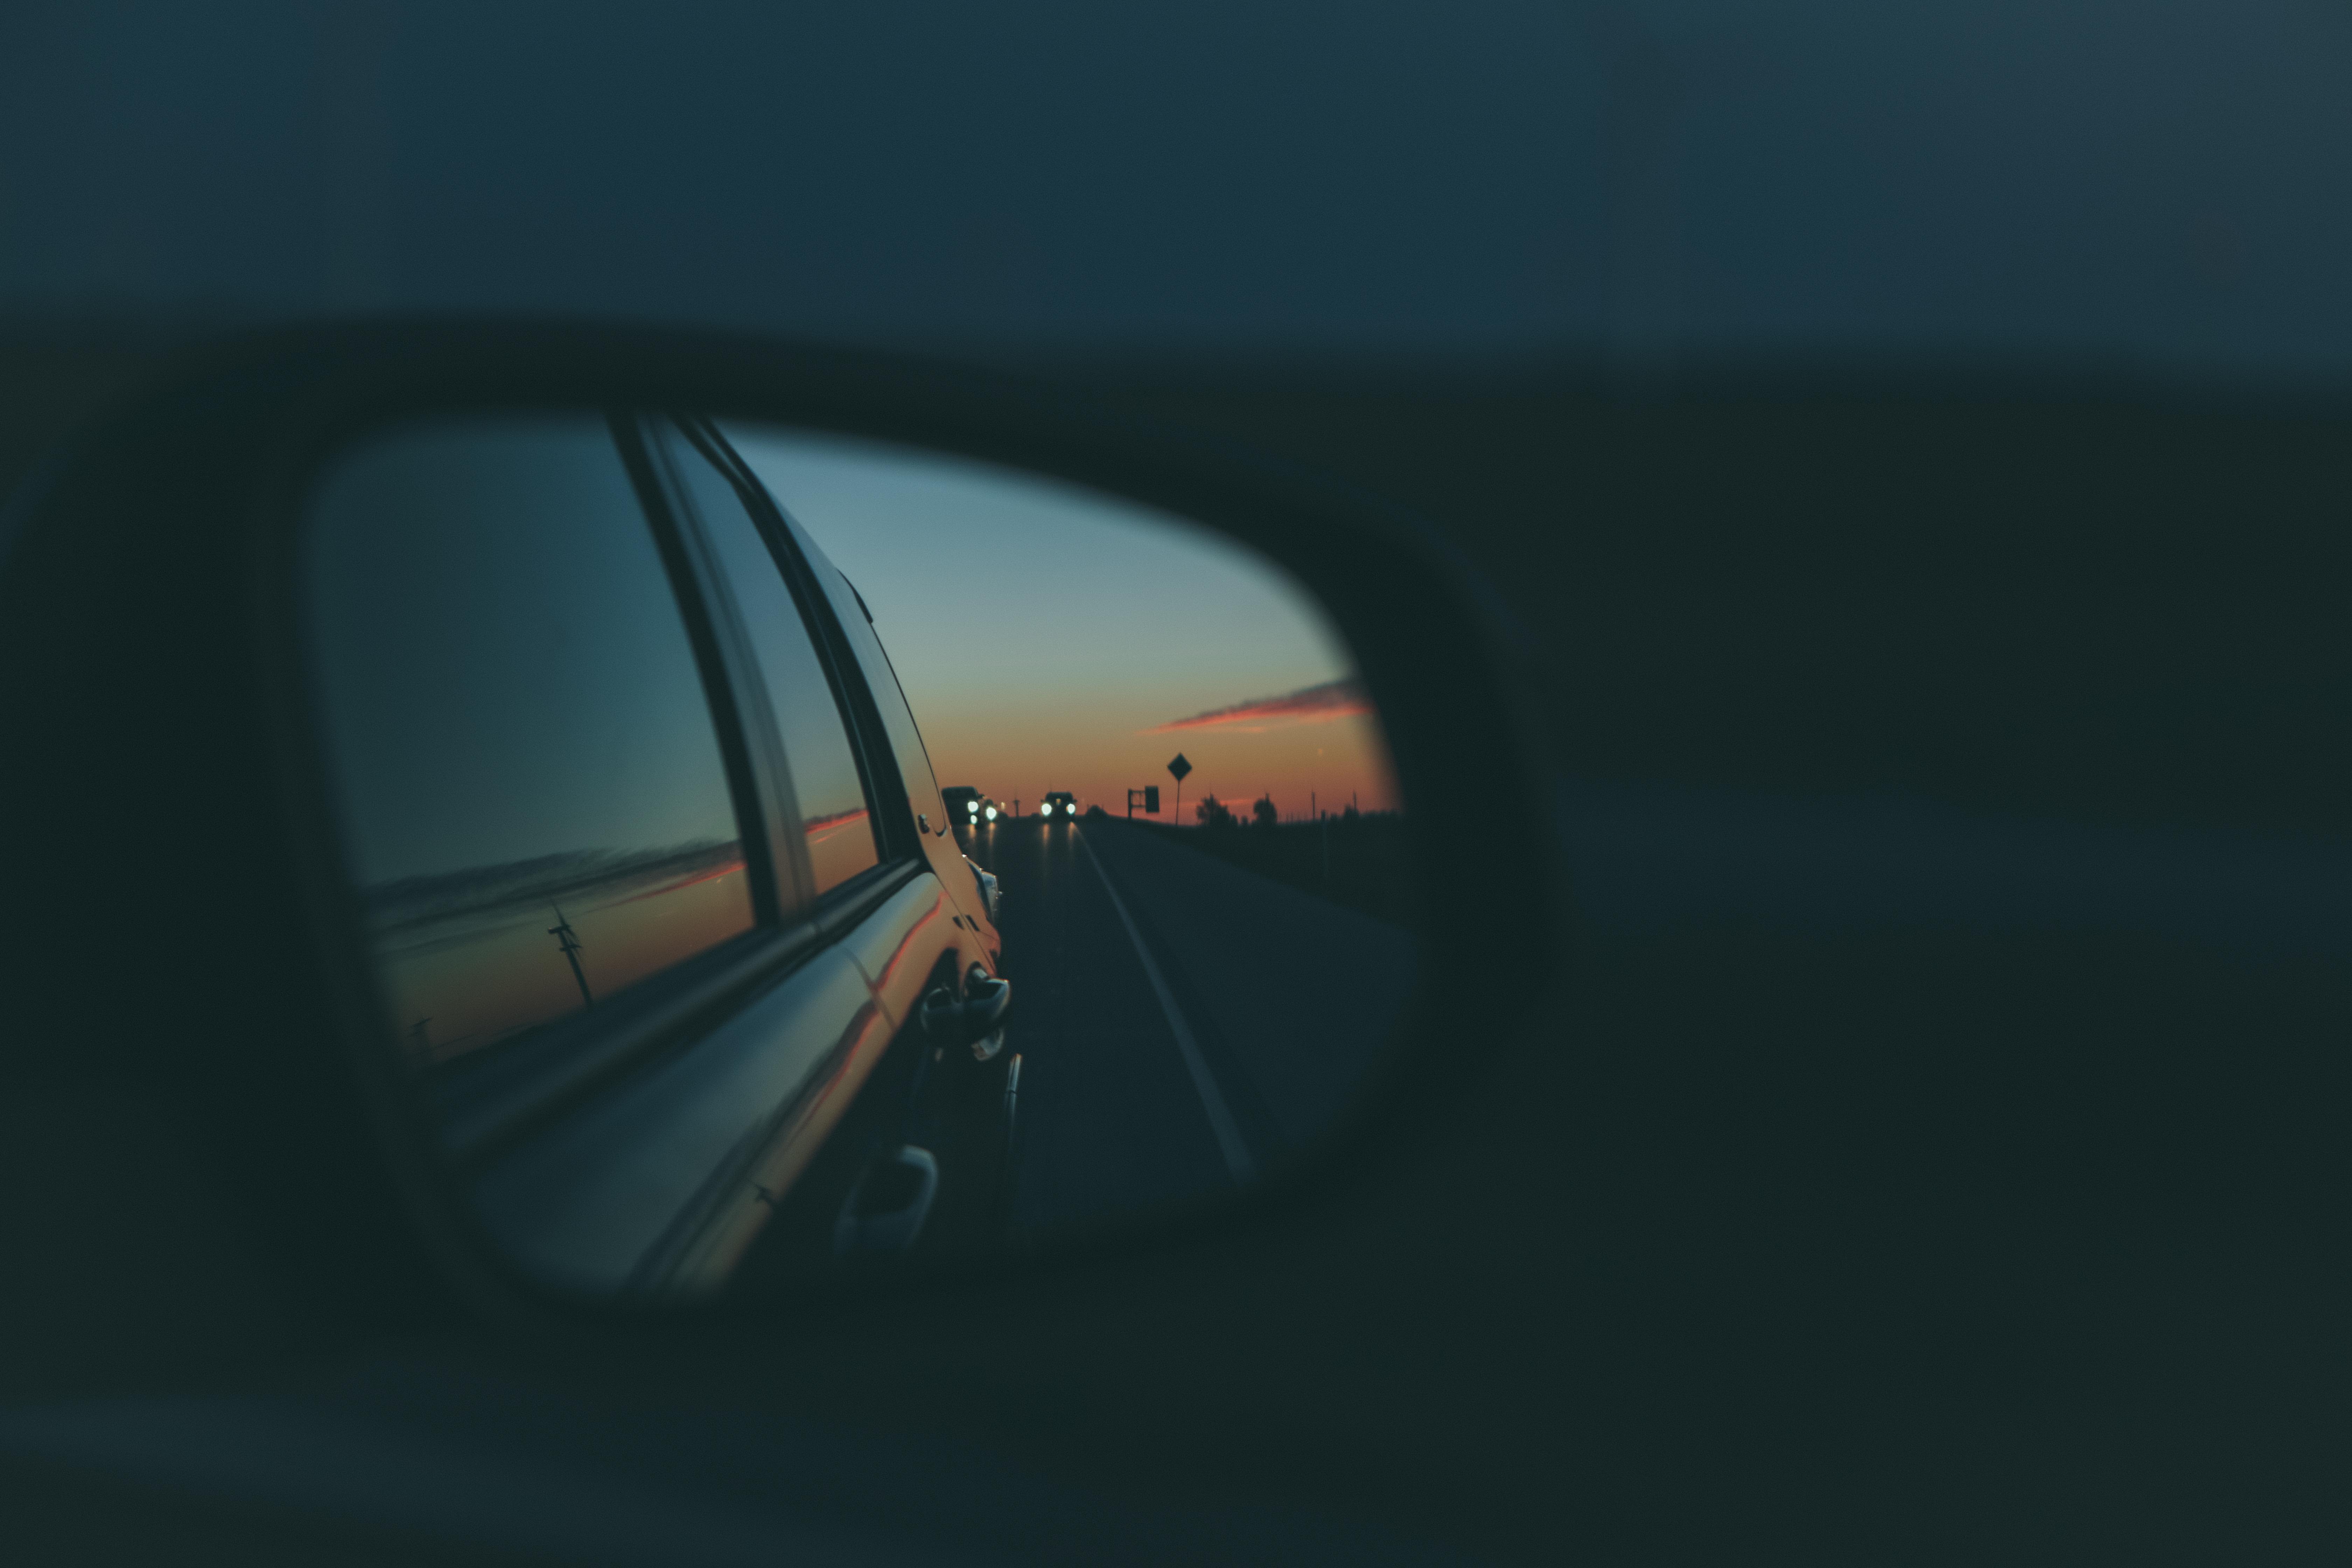 Bril Met Licht : Gratis afbeeldingen licht fotografie reflectie duisternis